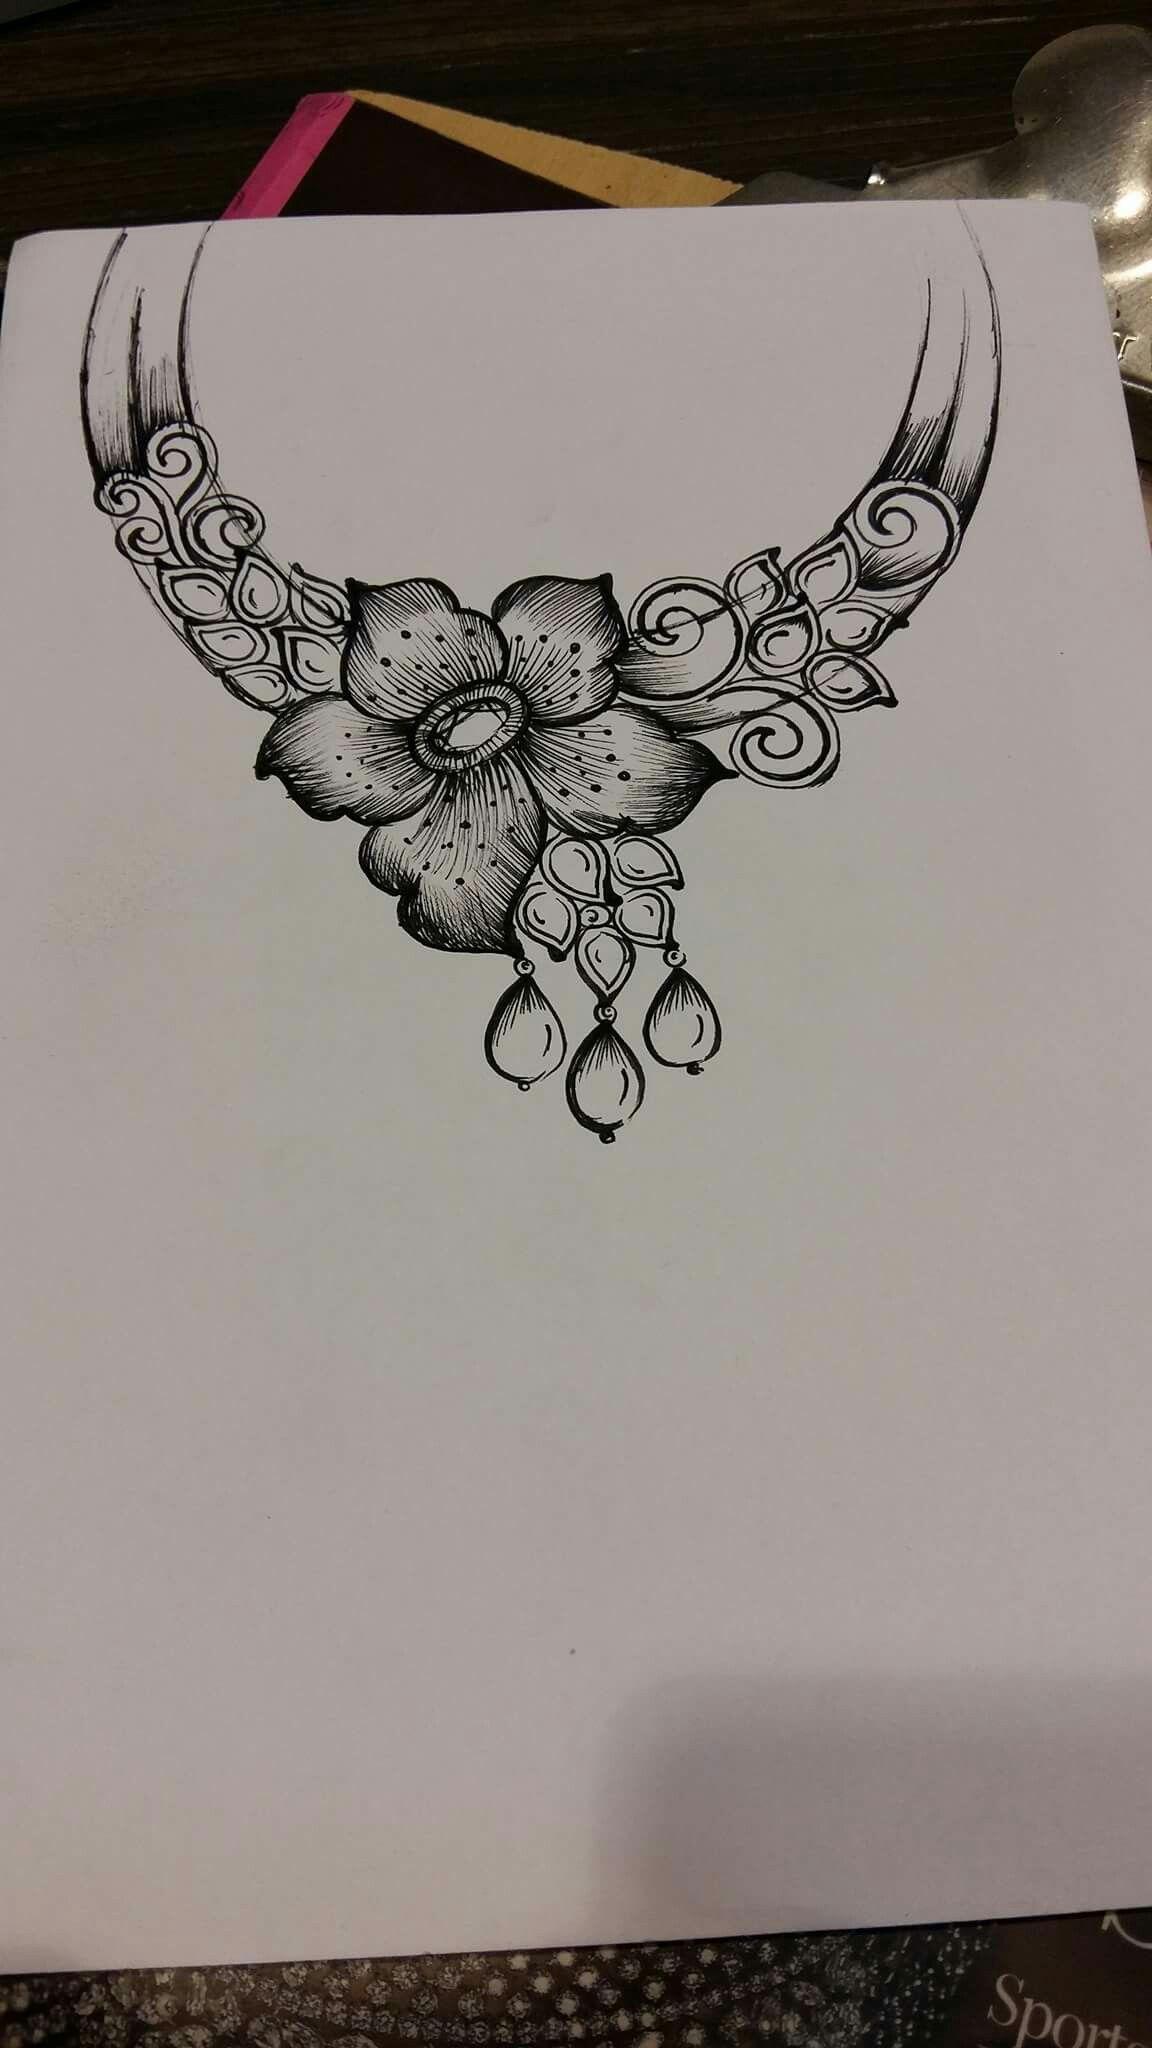 Pin By Vijay Soni On Jewellery Illustration Iii Jewellery Design Sketches Jewelry Design Drawing Jewelry Drawing